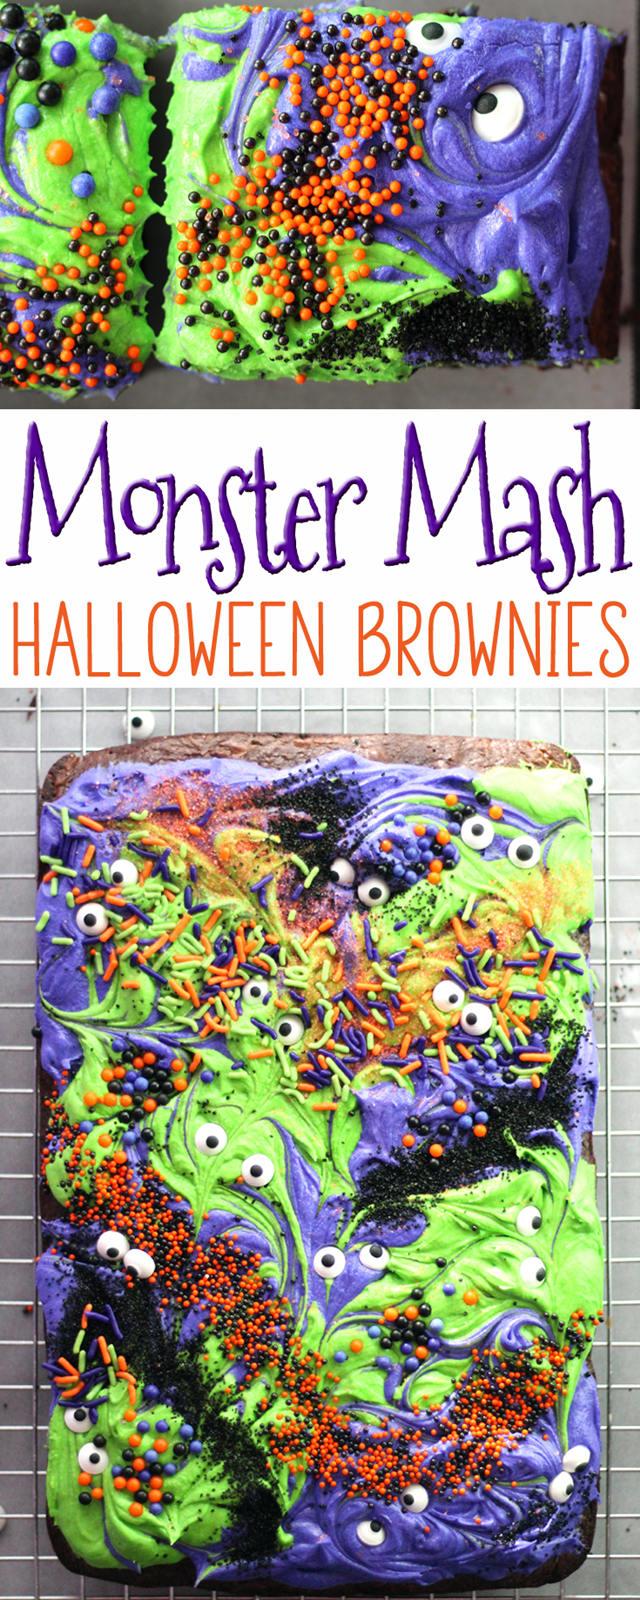 Monster Mash Halloween Brownies